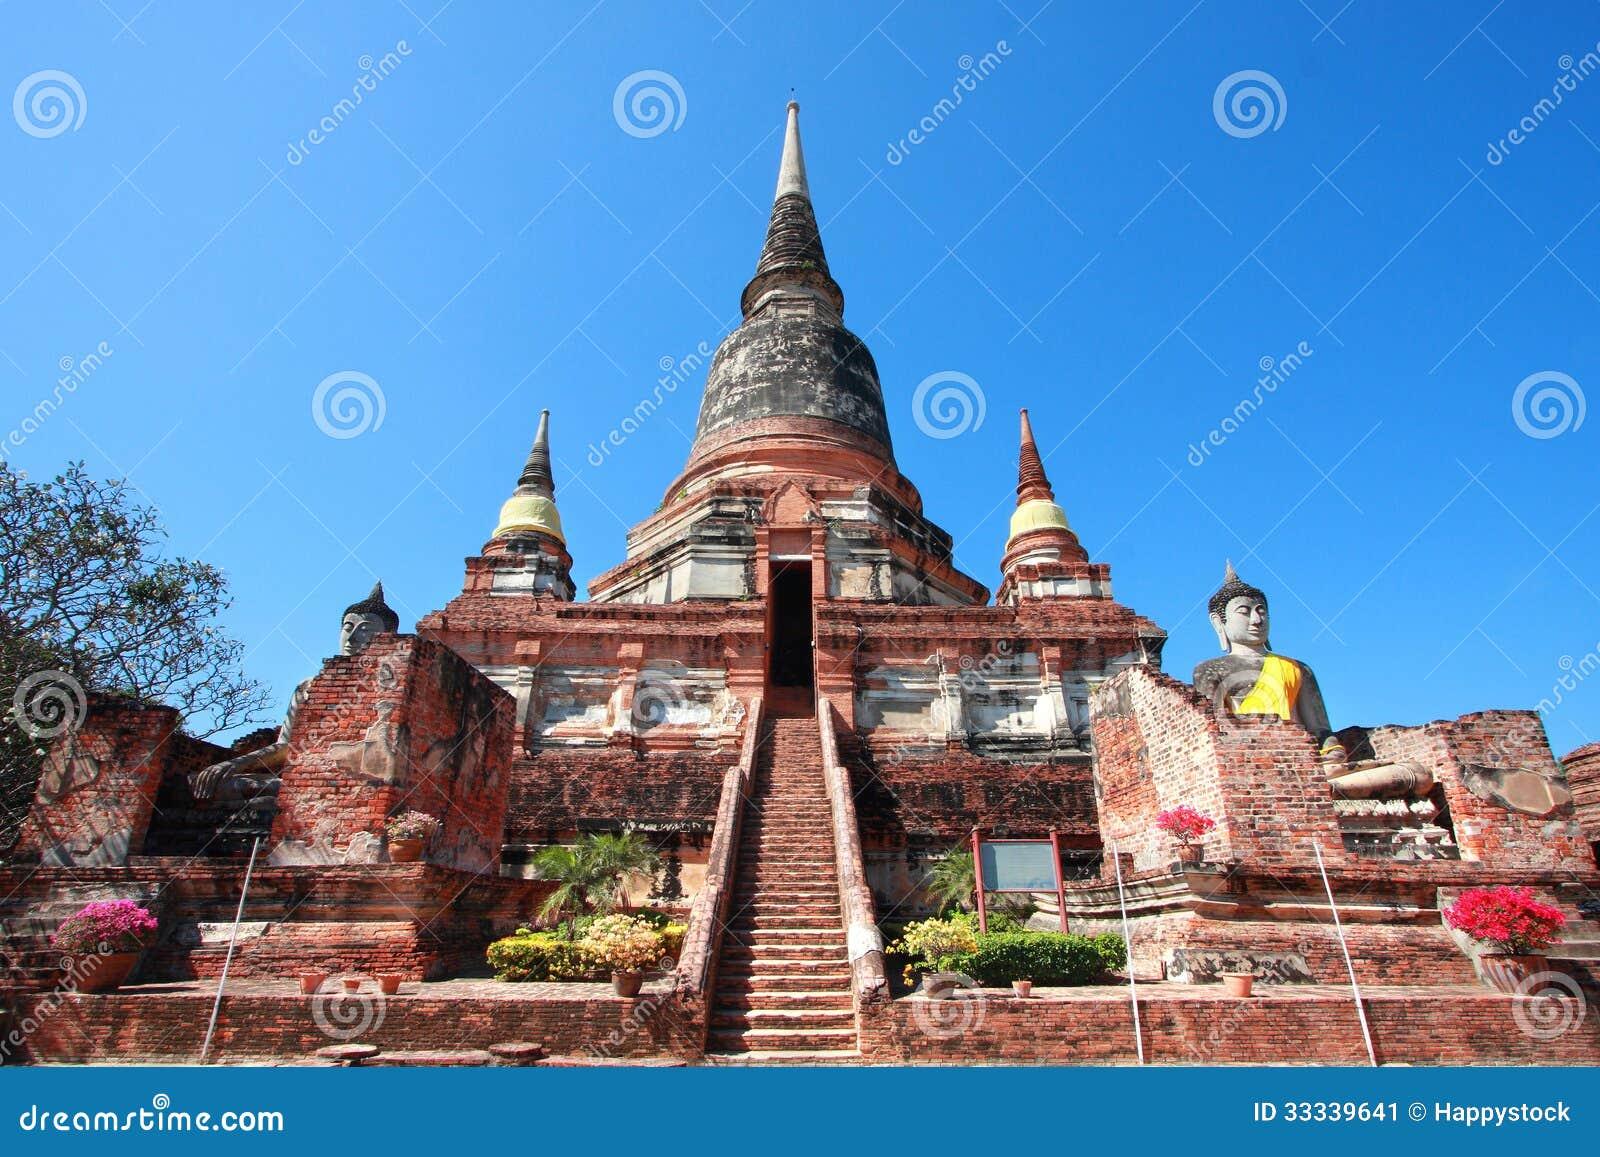 Wat Yai Chai Mongkol Stock Image - Image: 33339641